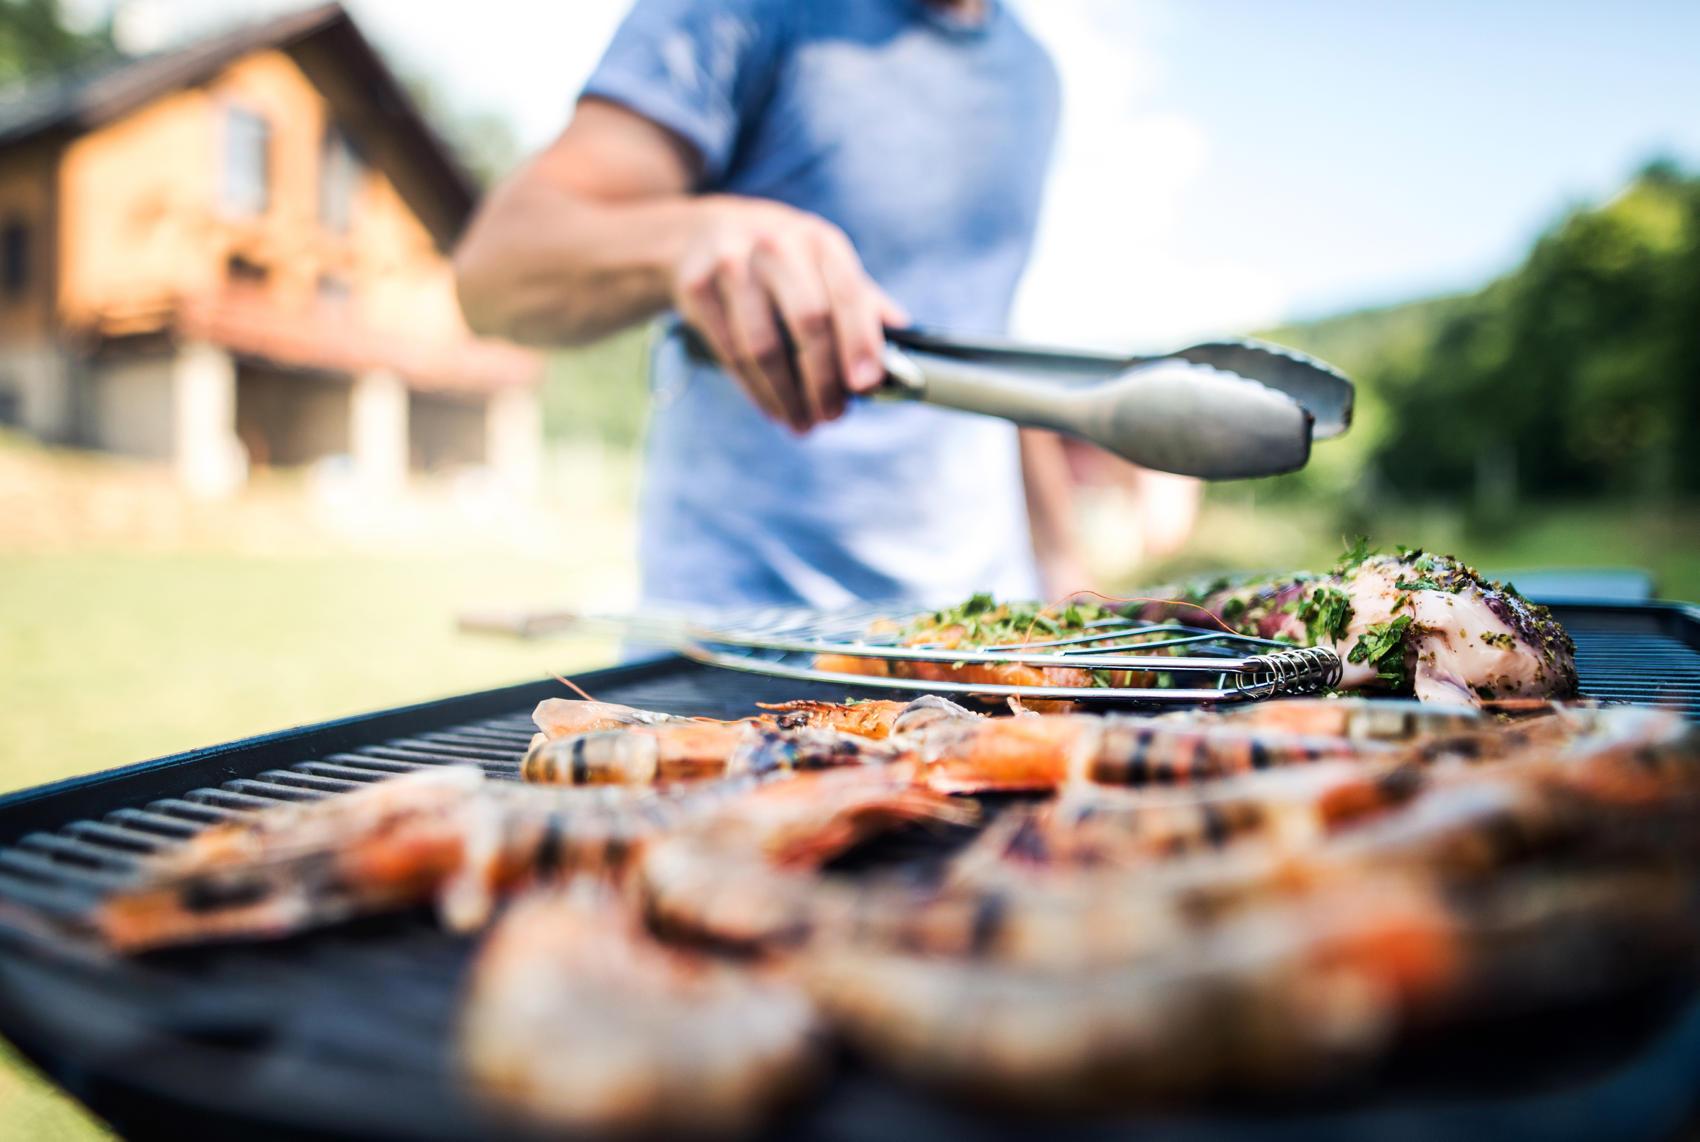 Choisir un barbecue | Dossier Familial